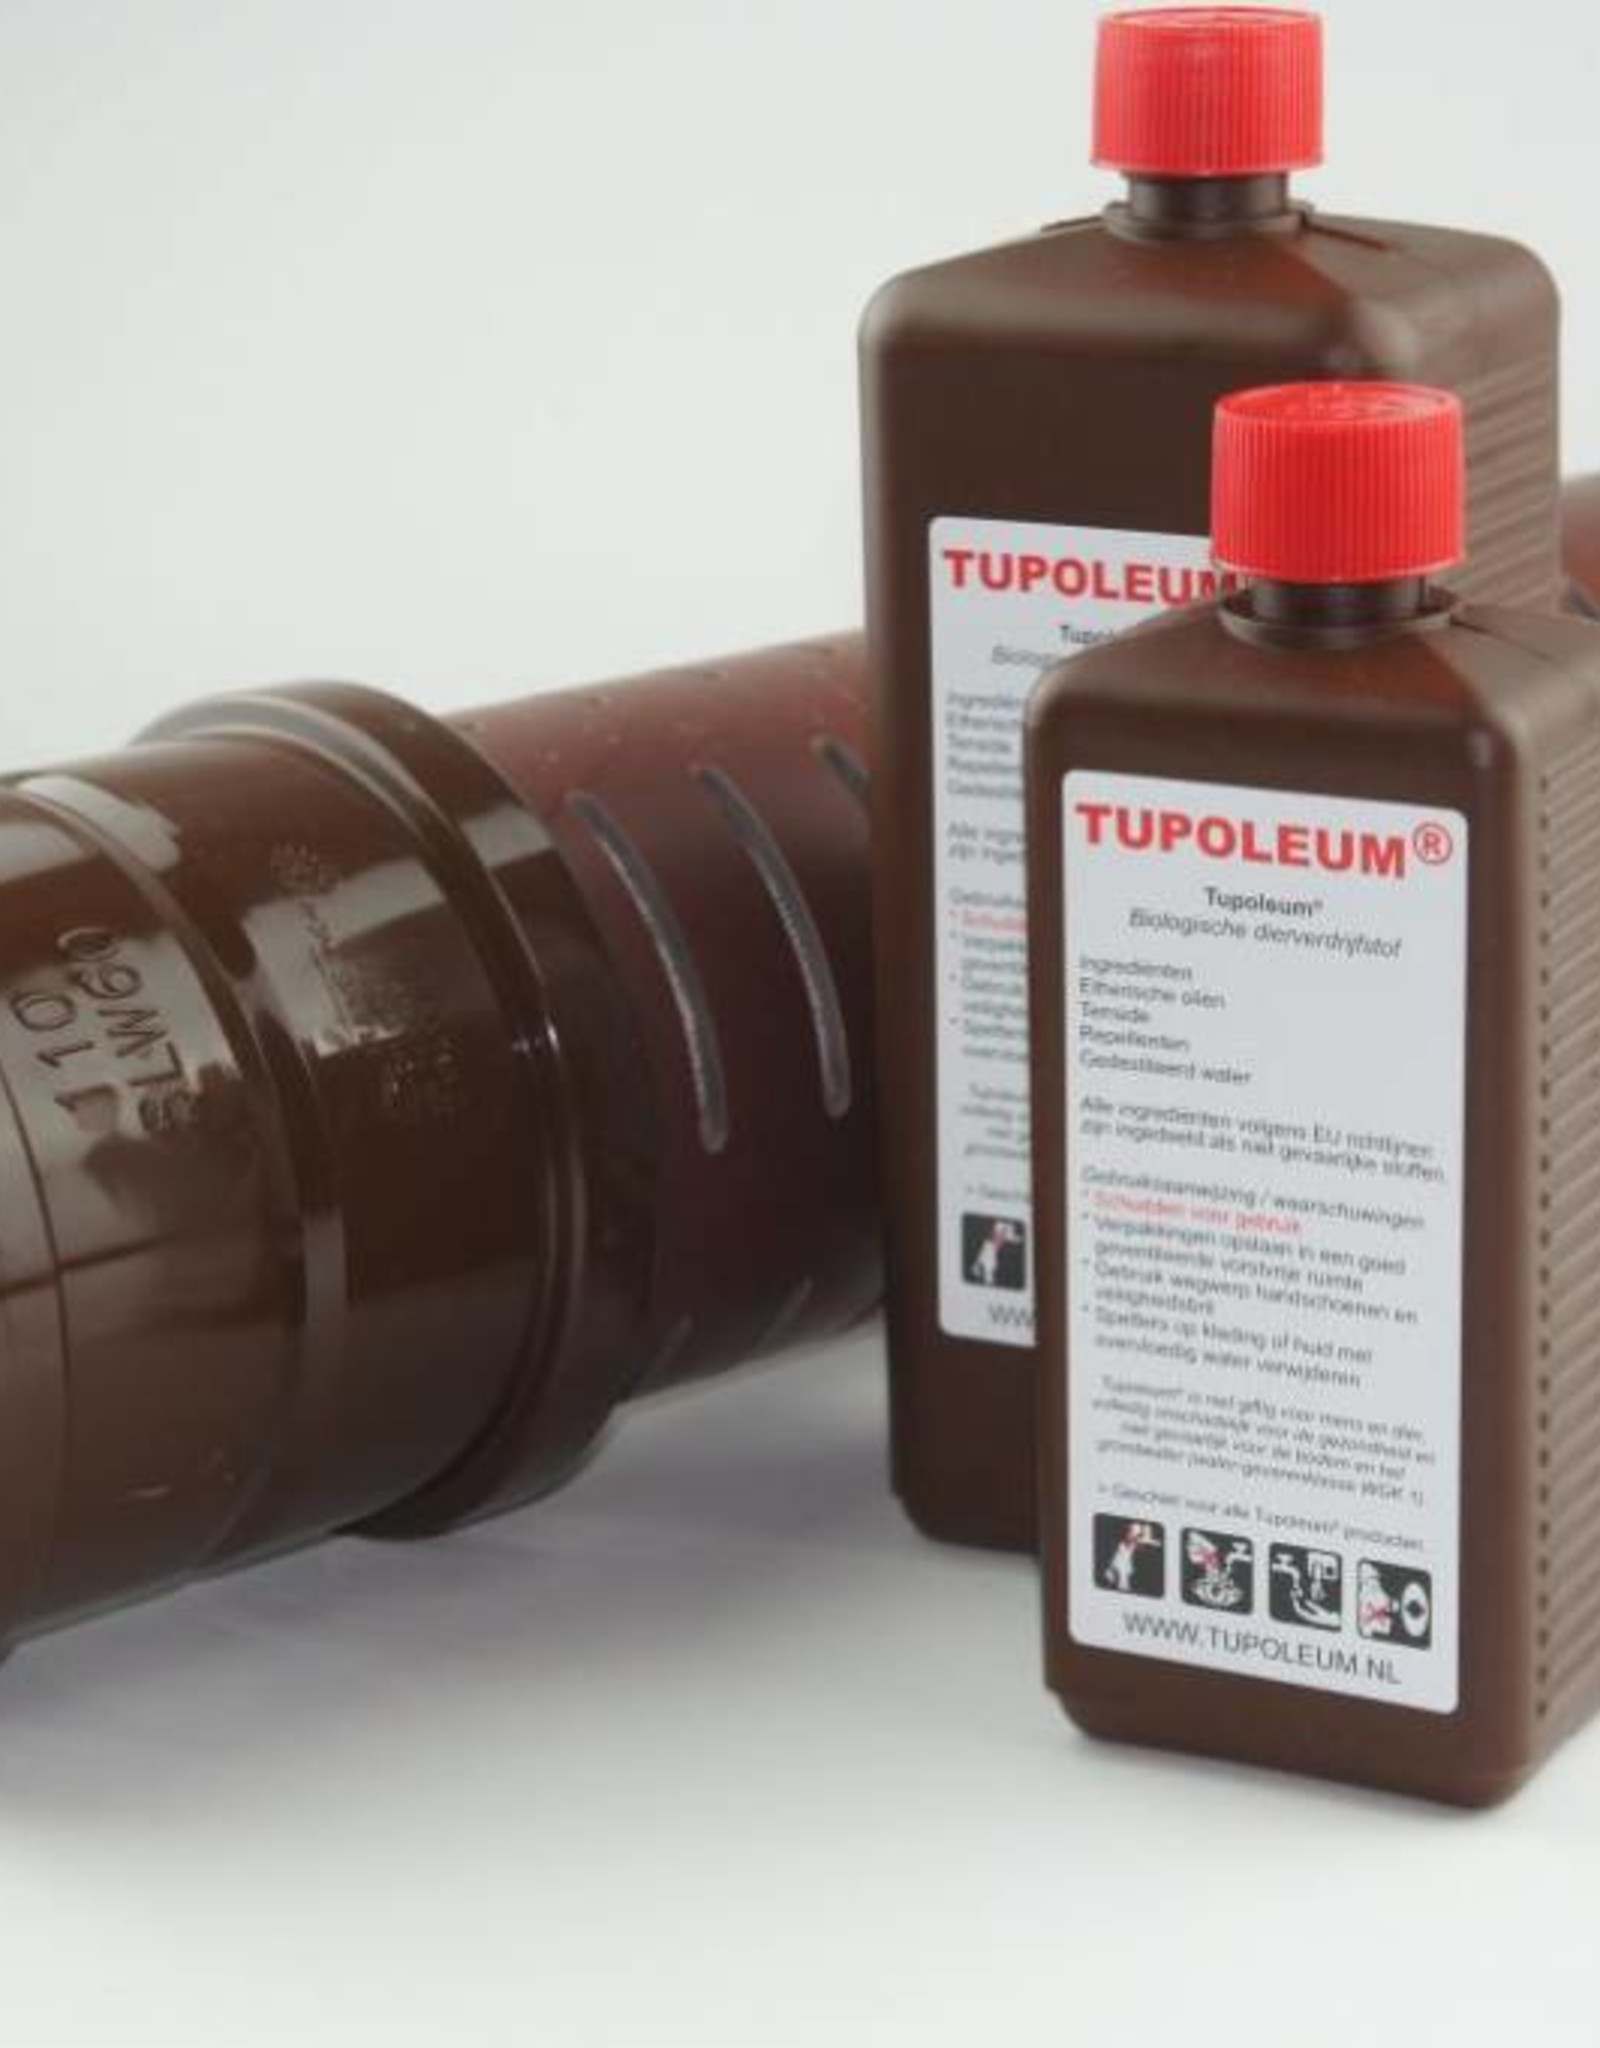 Brimex Tupoleum Konijnen weren met geur